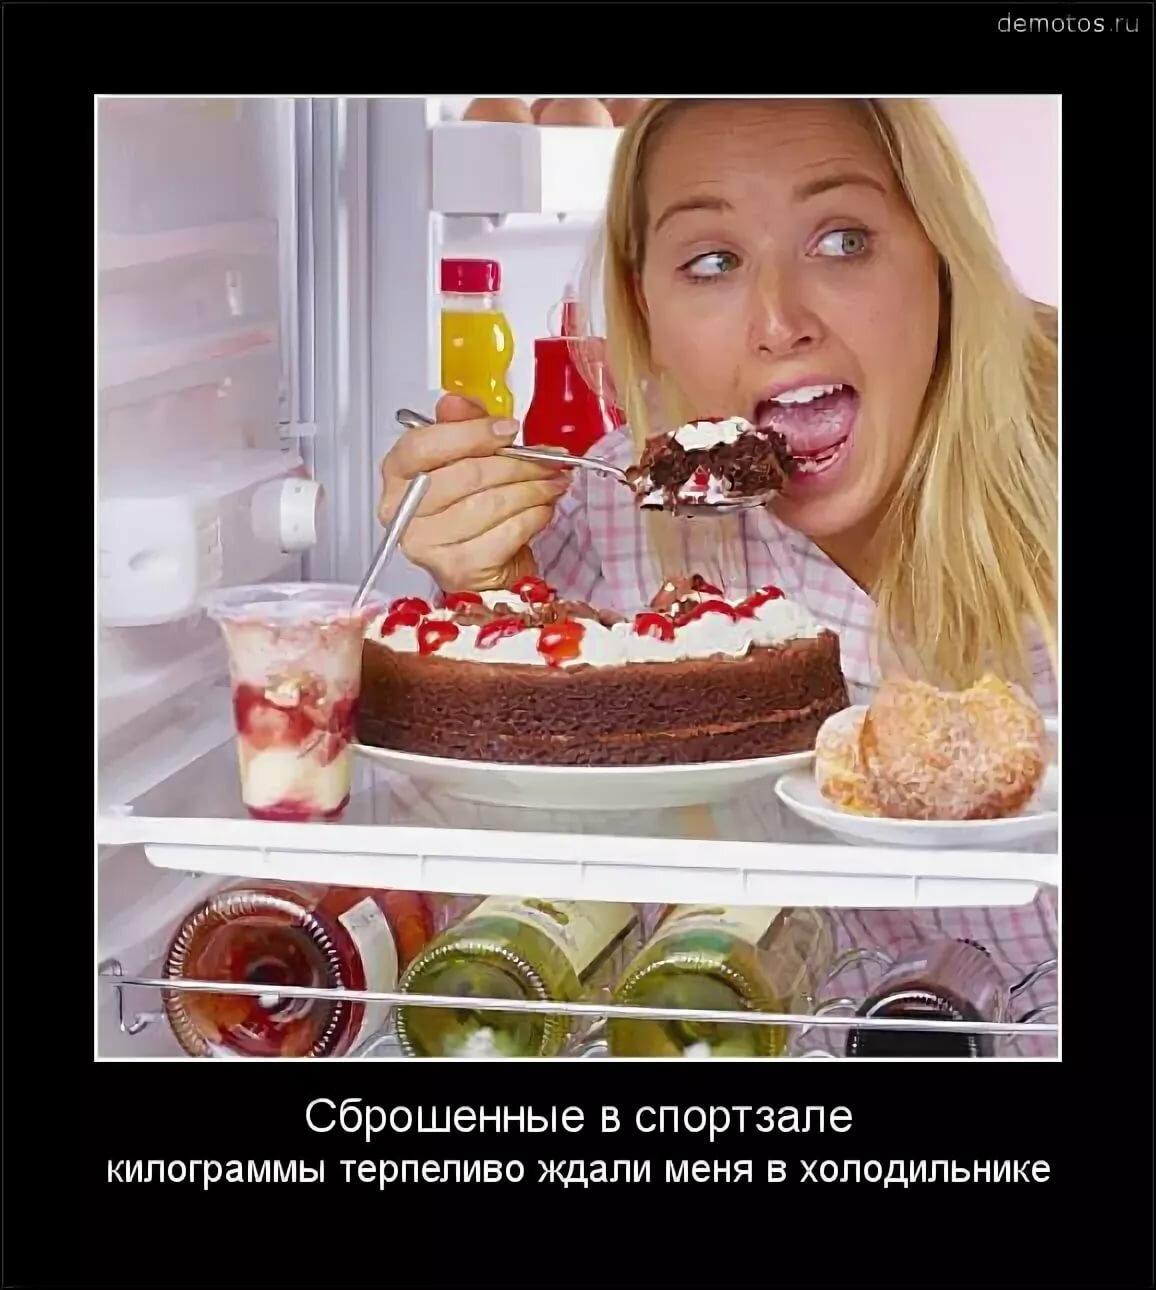 завтра на диету картинки день